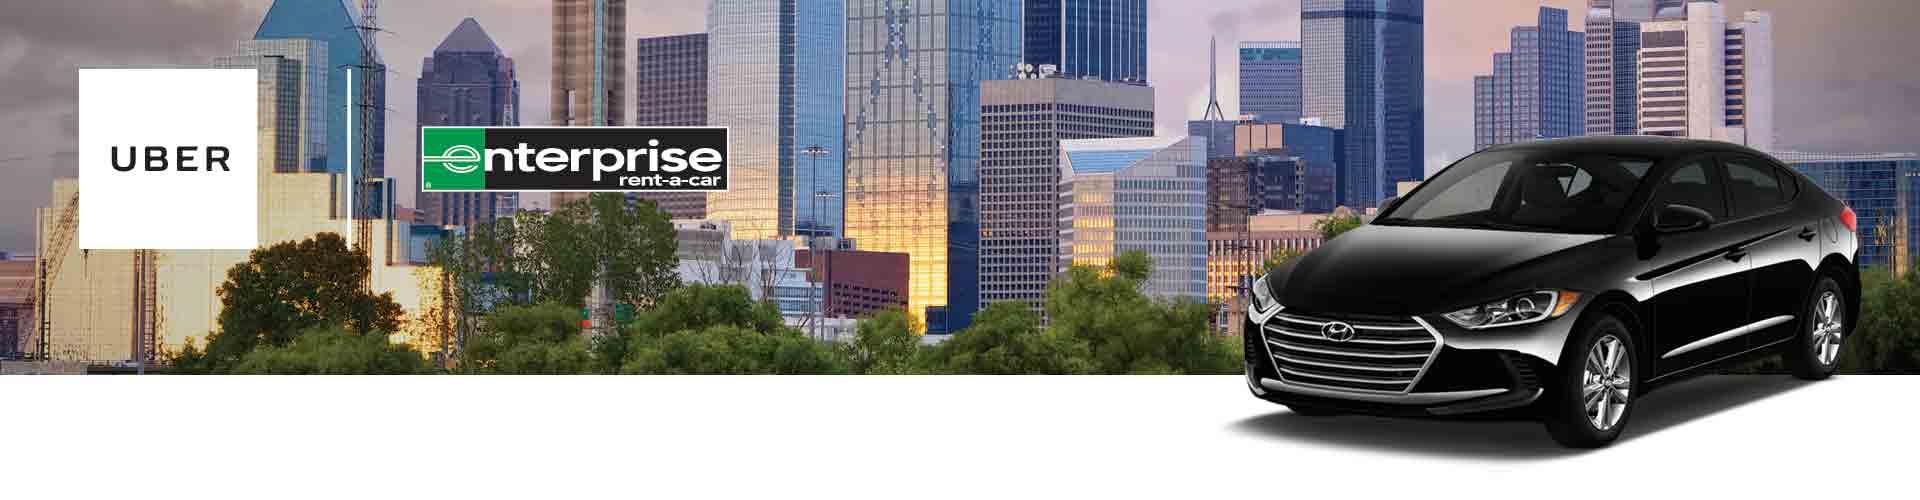 Dallas rental cars for uber drivers enterprise rent a car